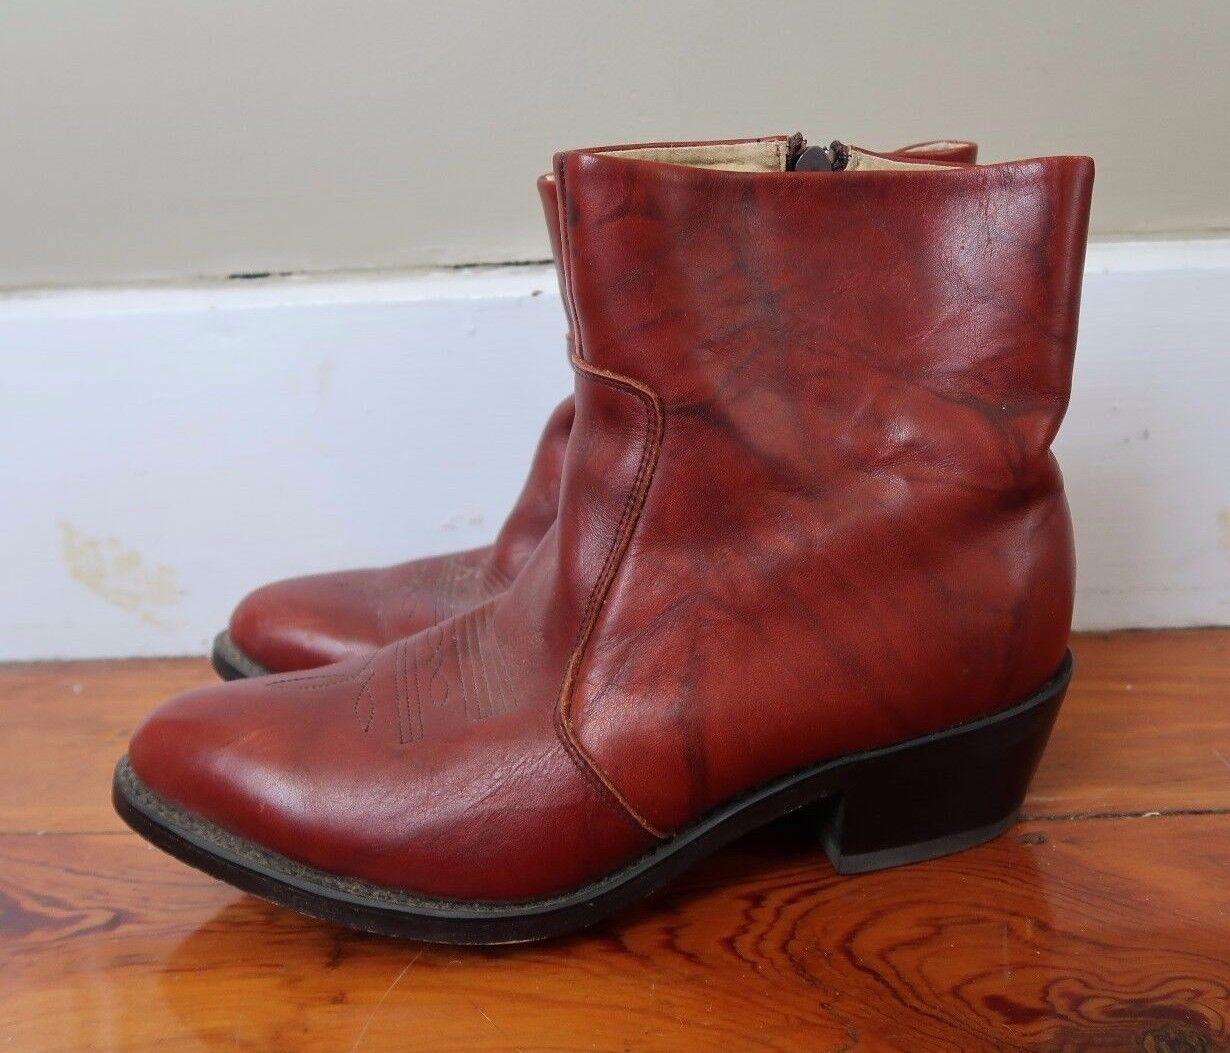 Durango Damens's 8.5 D cherry Braun western cowboy Leder ankle boots booties